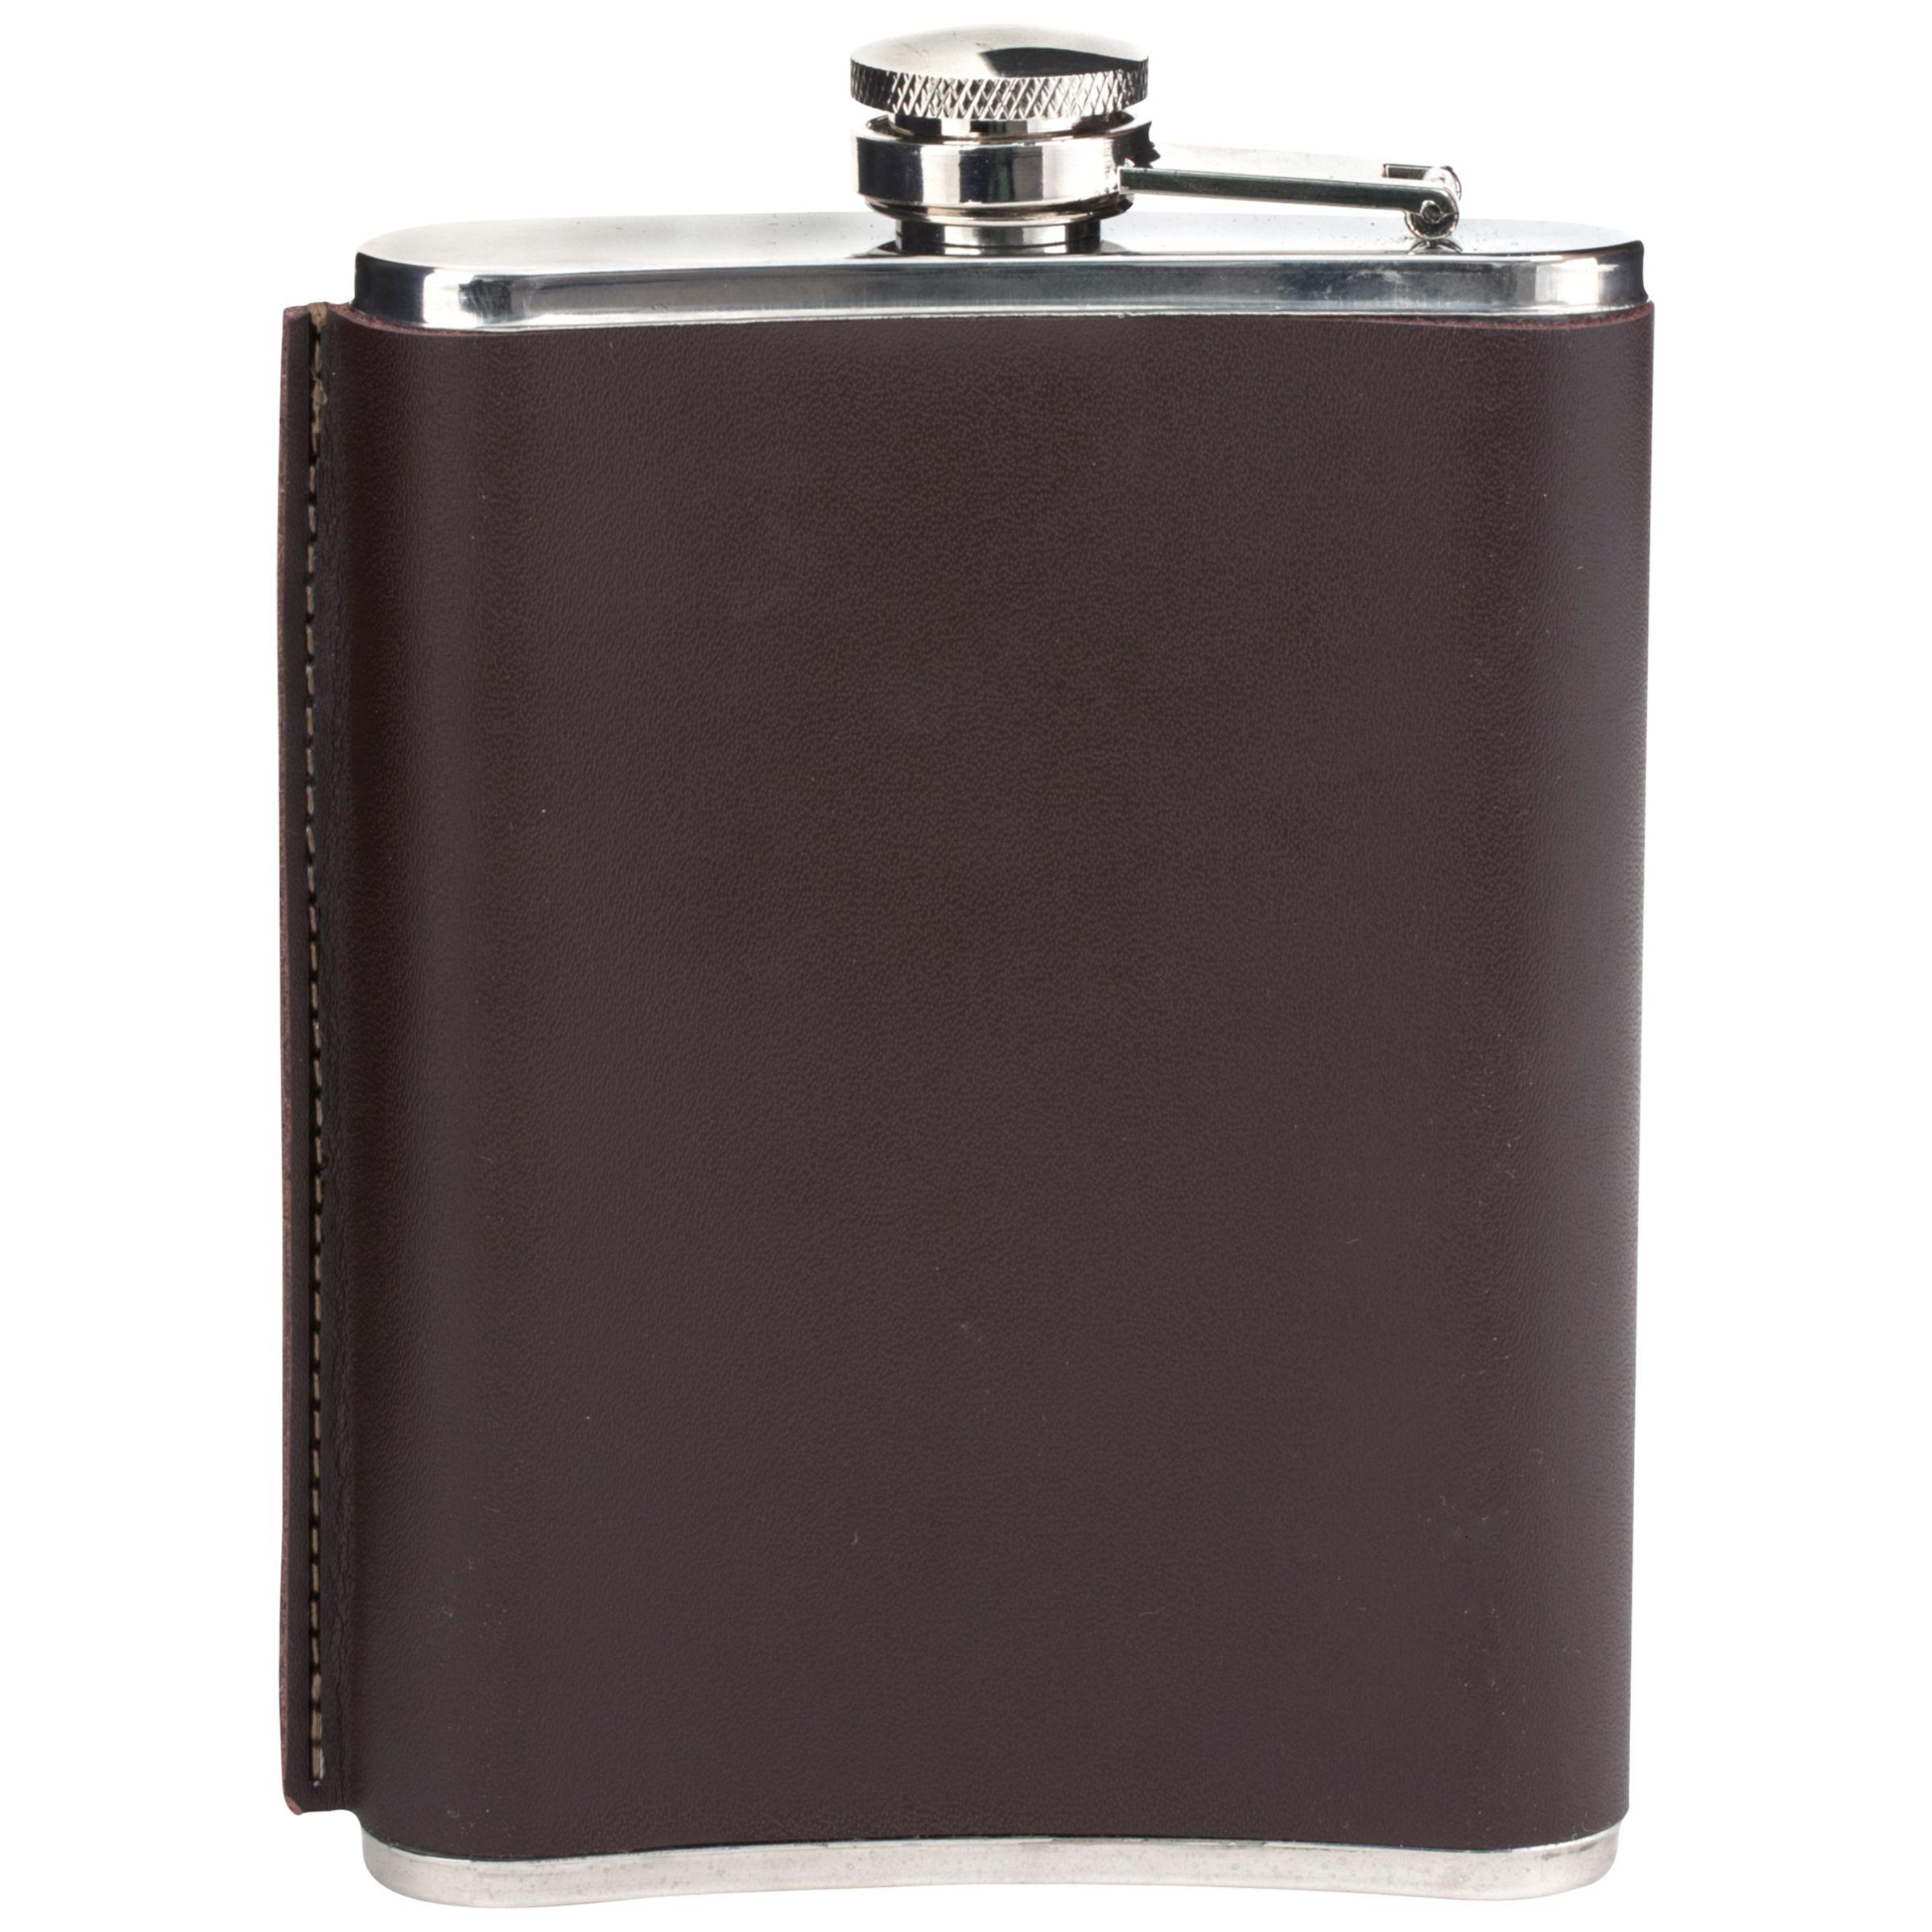 Kikkerland Kikkerland Leather Hip Flask, 180ml